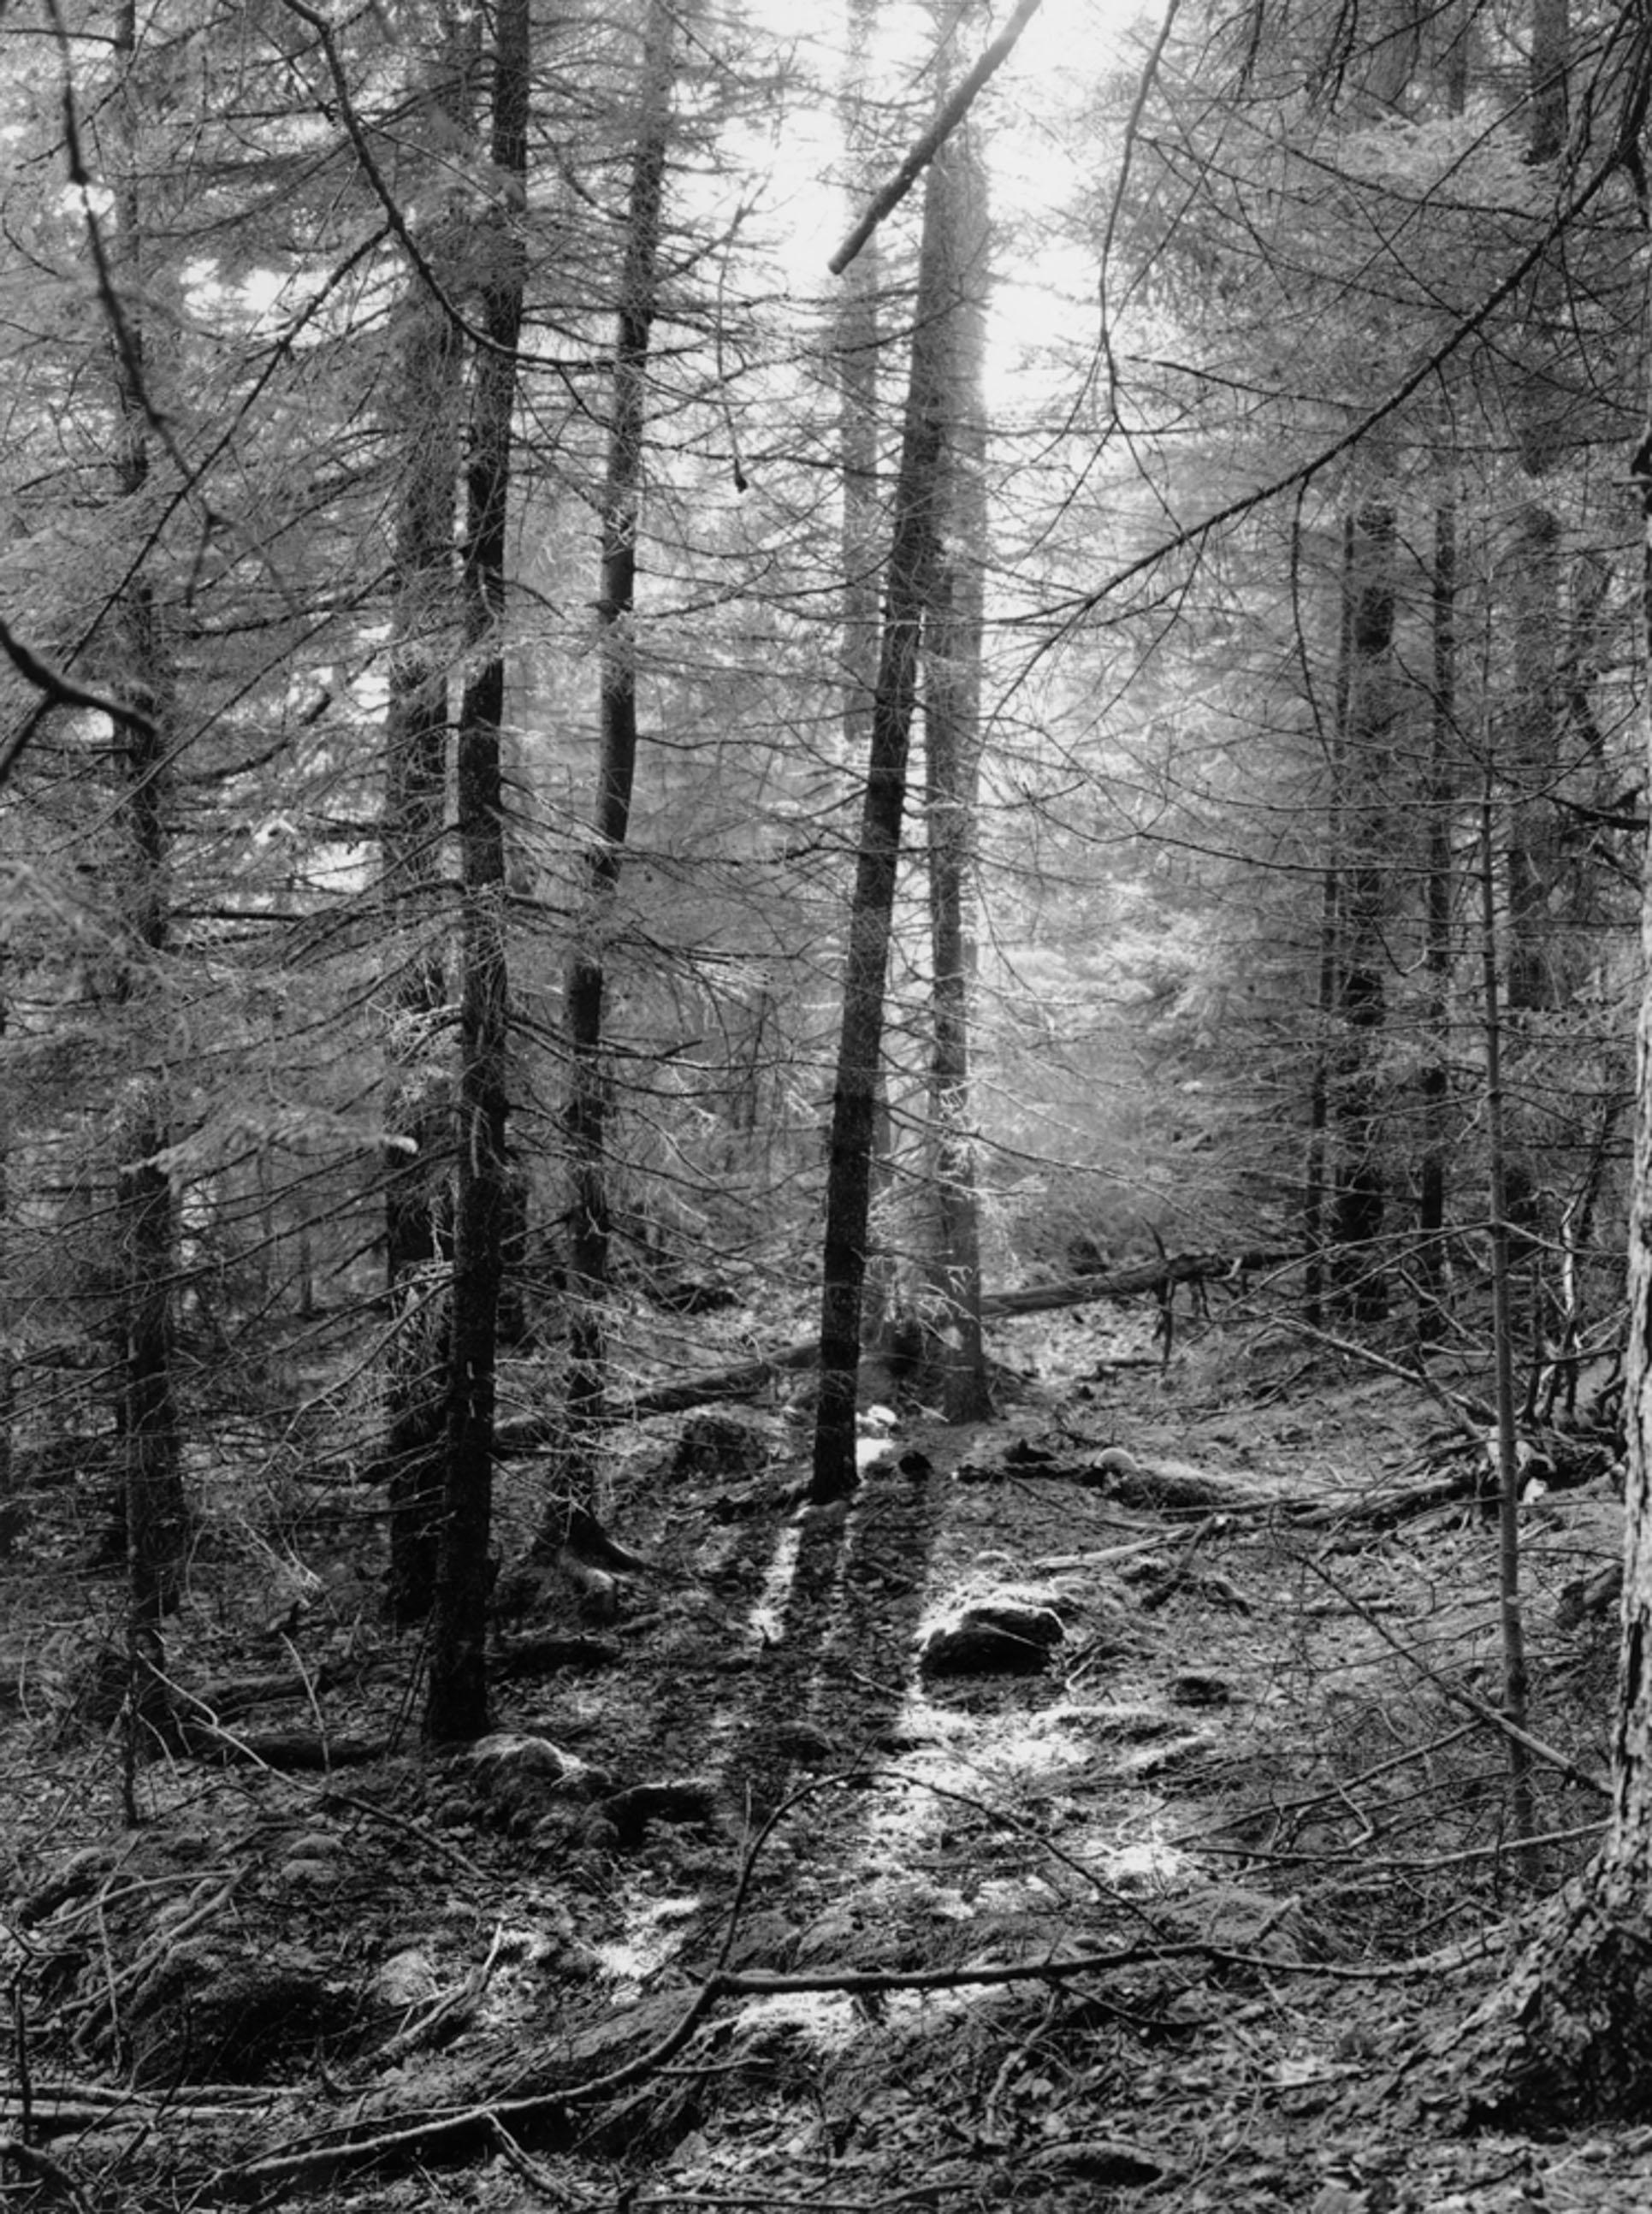 Woods Preble Island, Maine